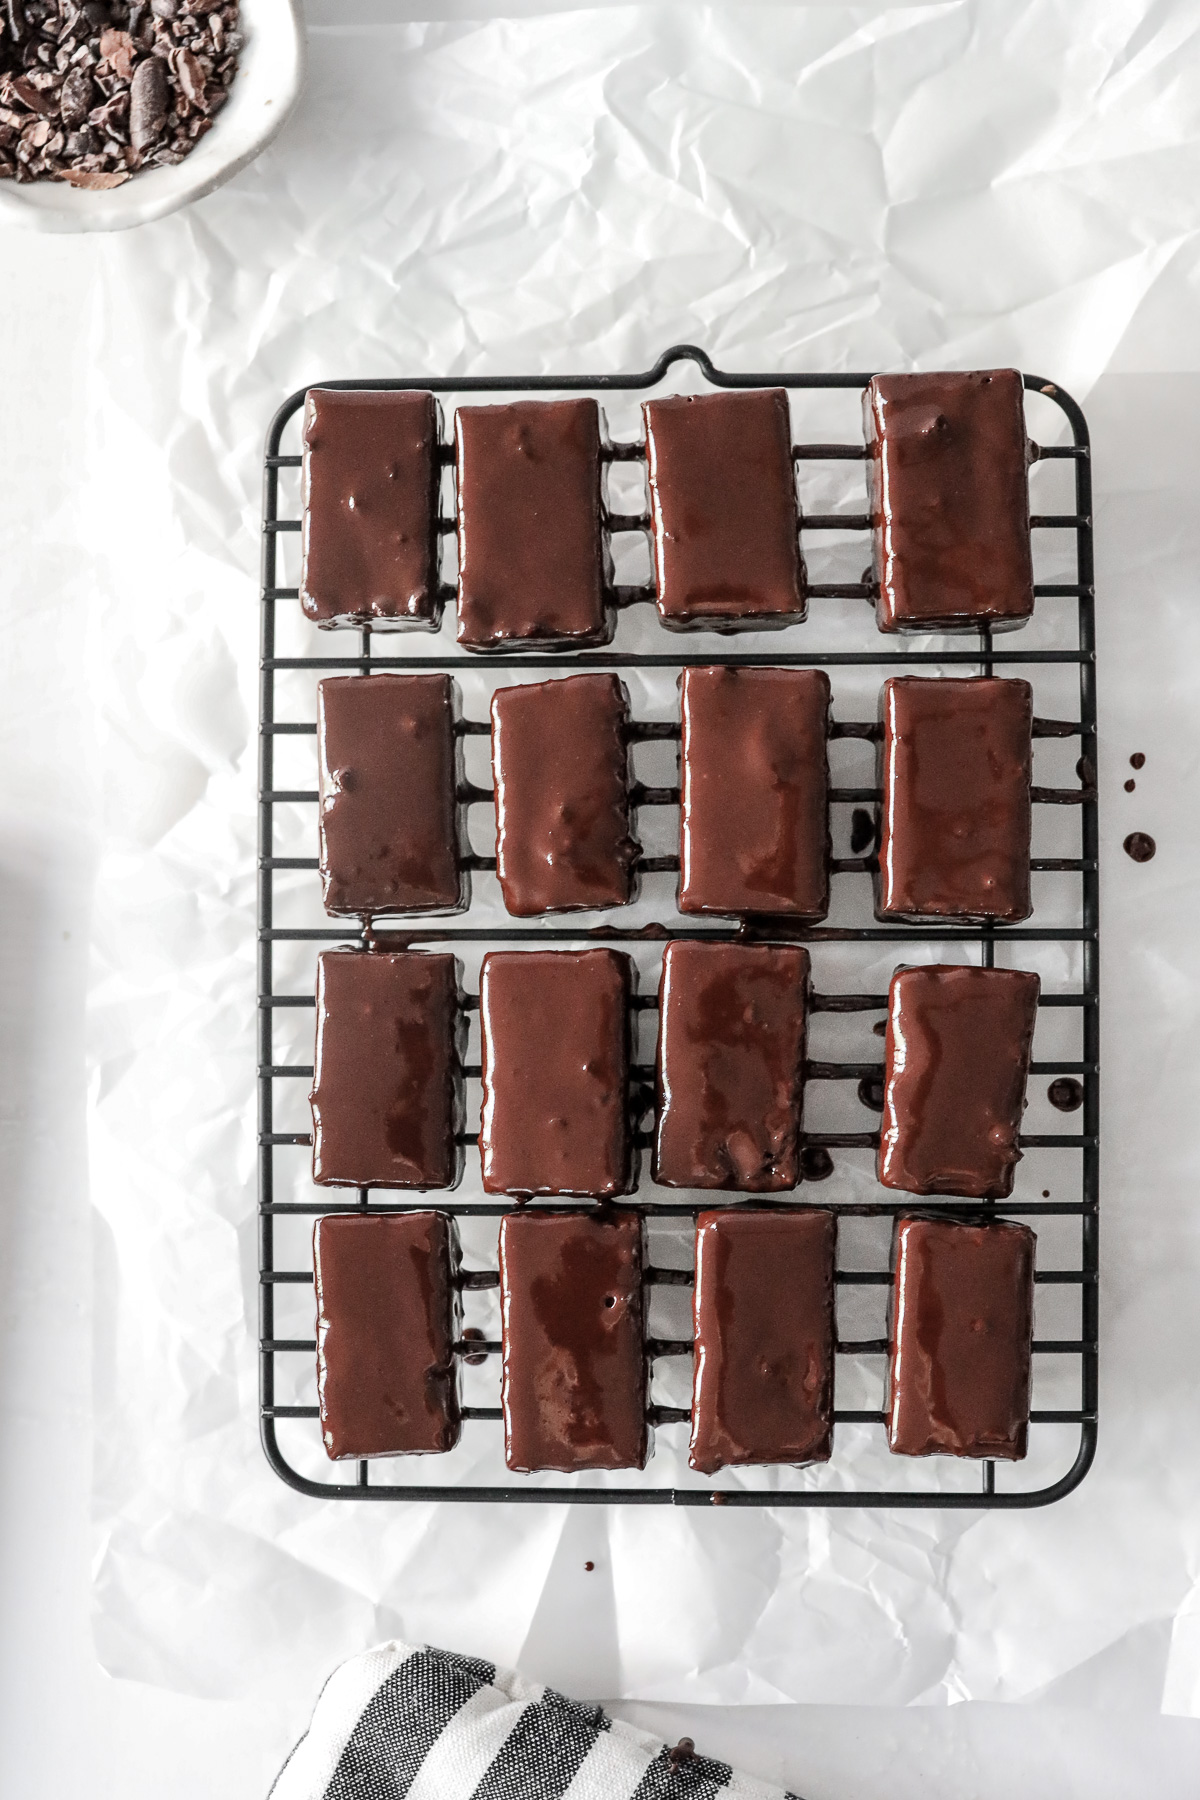 Minty Cake Fudge Bites